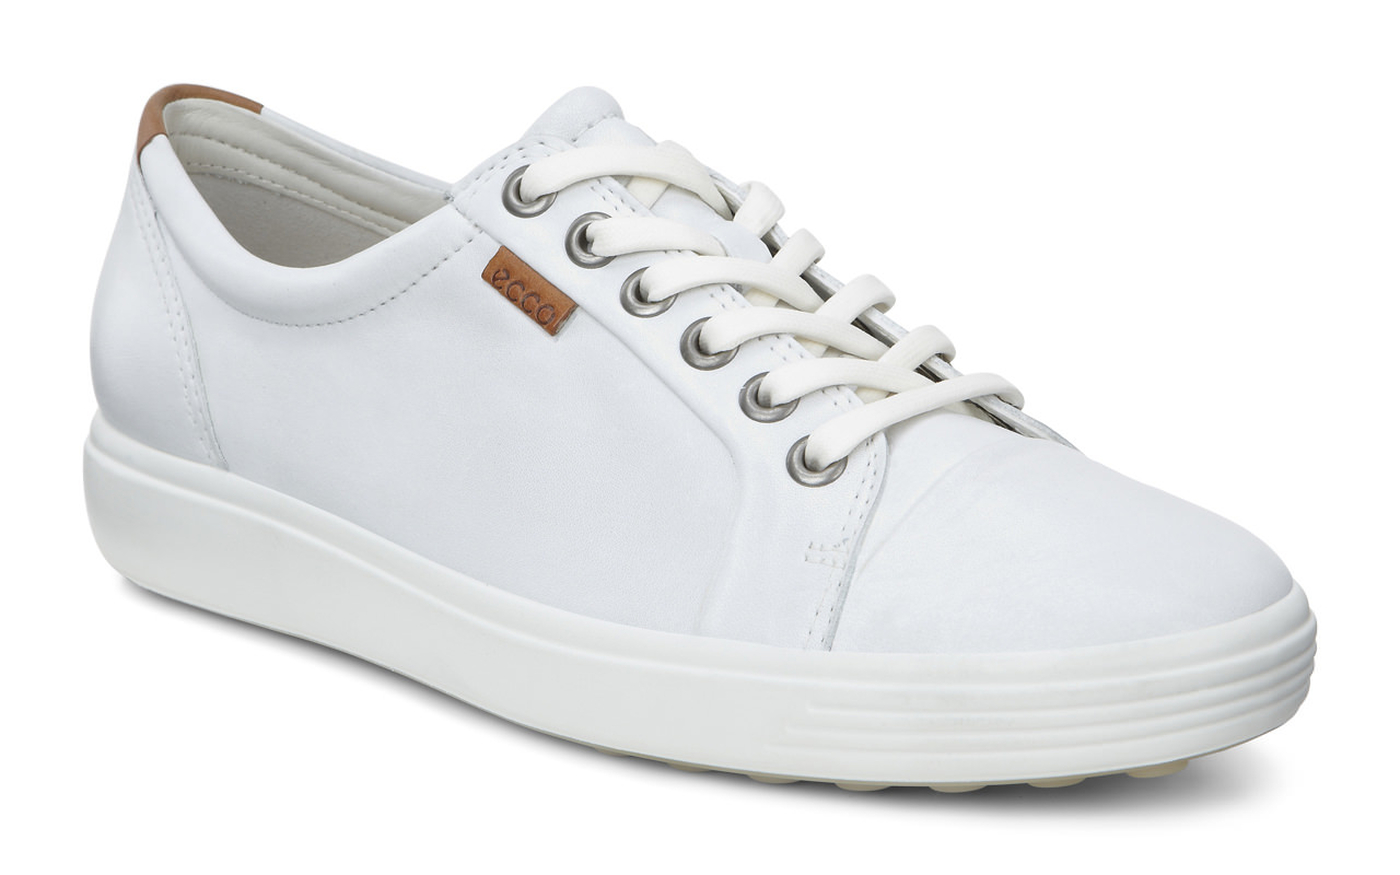 bd3d55ee42d0 ECCO Women s Soft 7 Sneaker